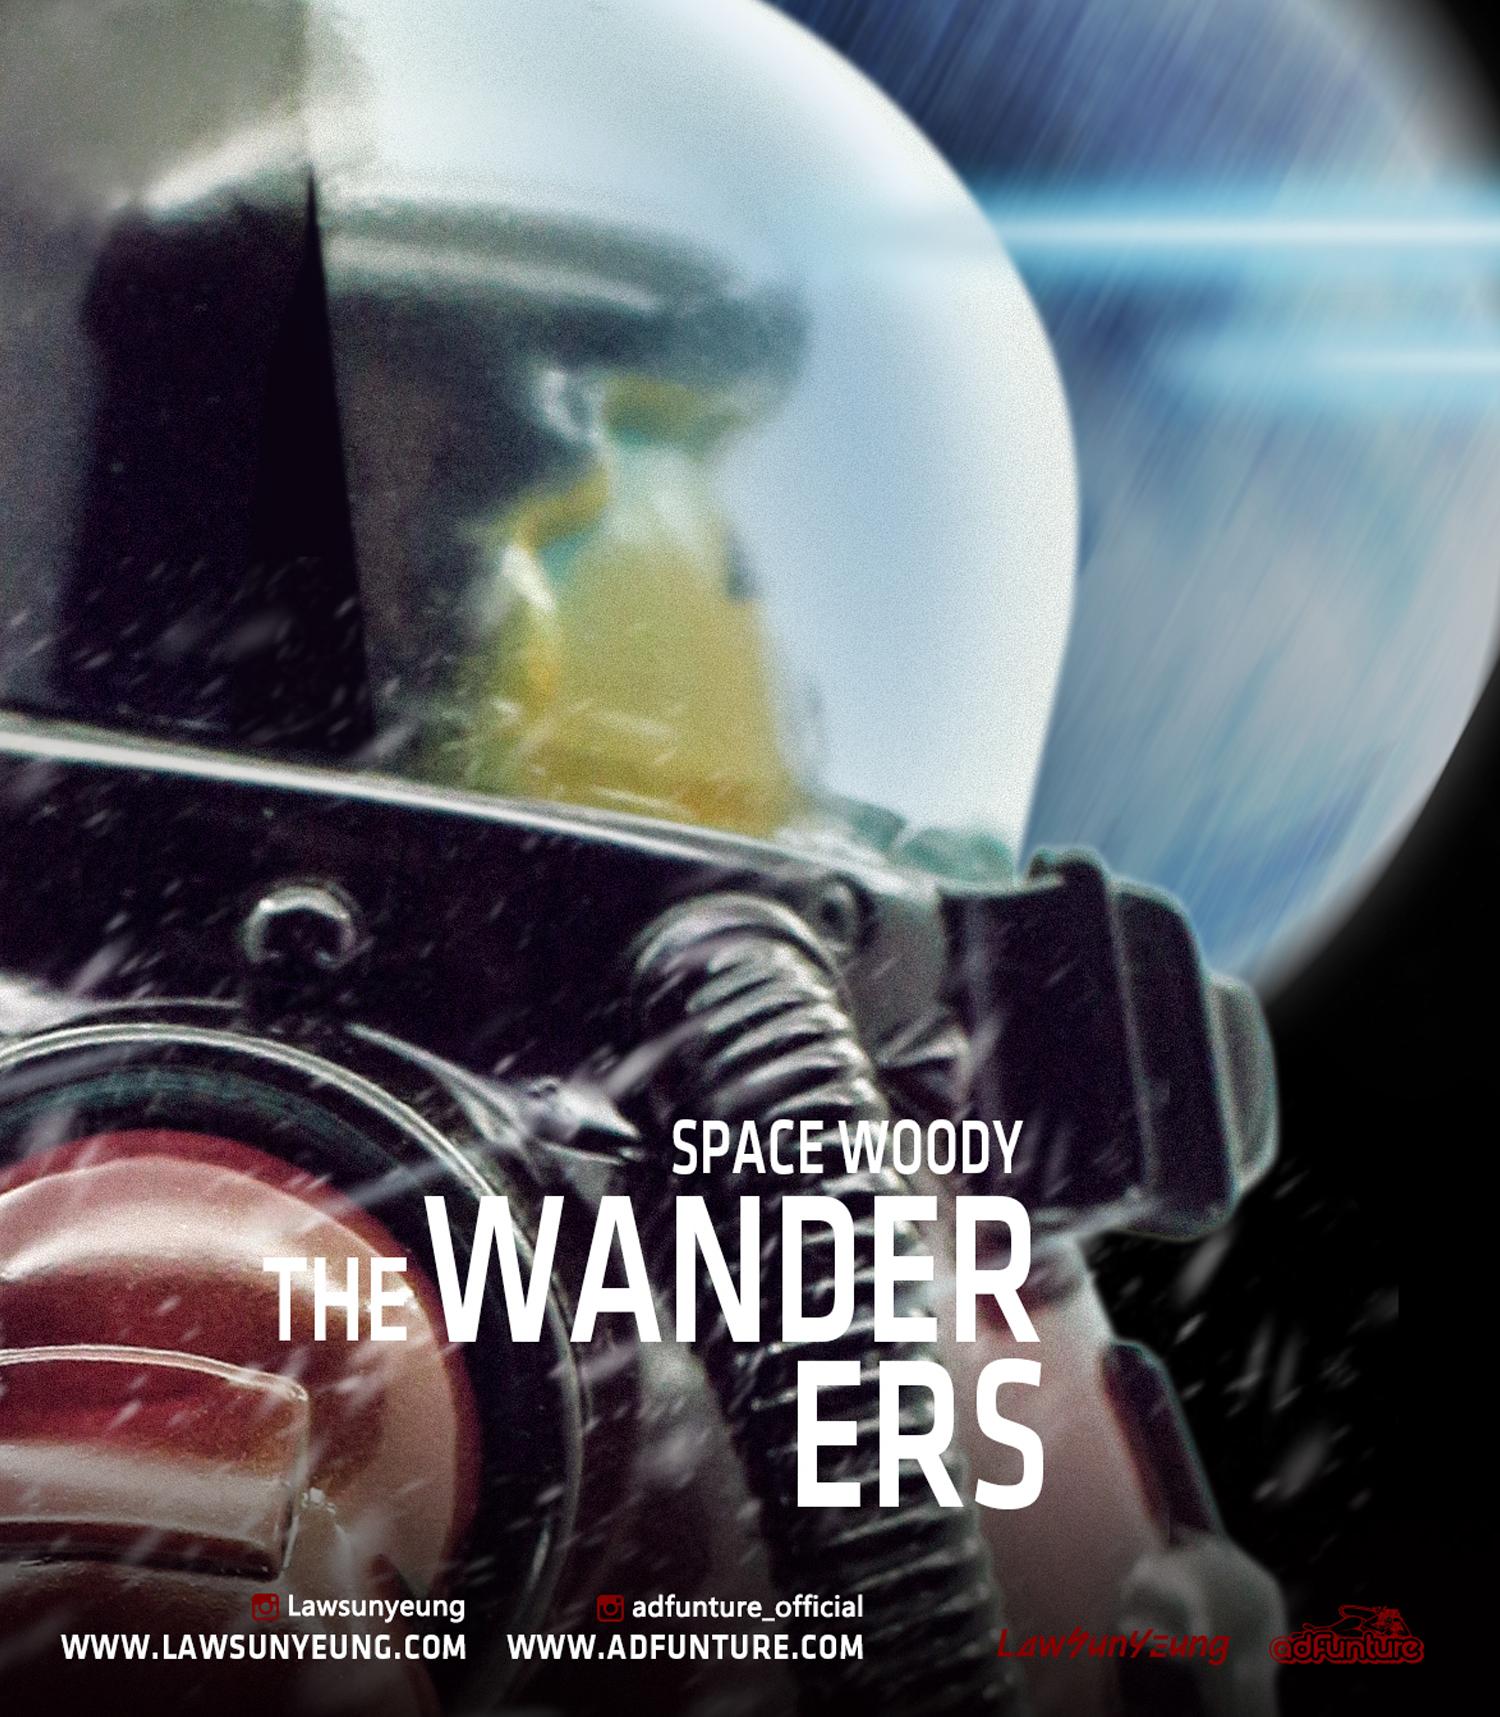 wanderers-IG-1.jpg